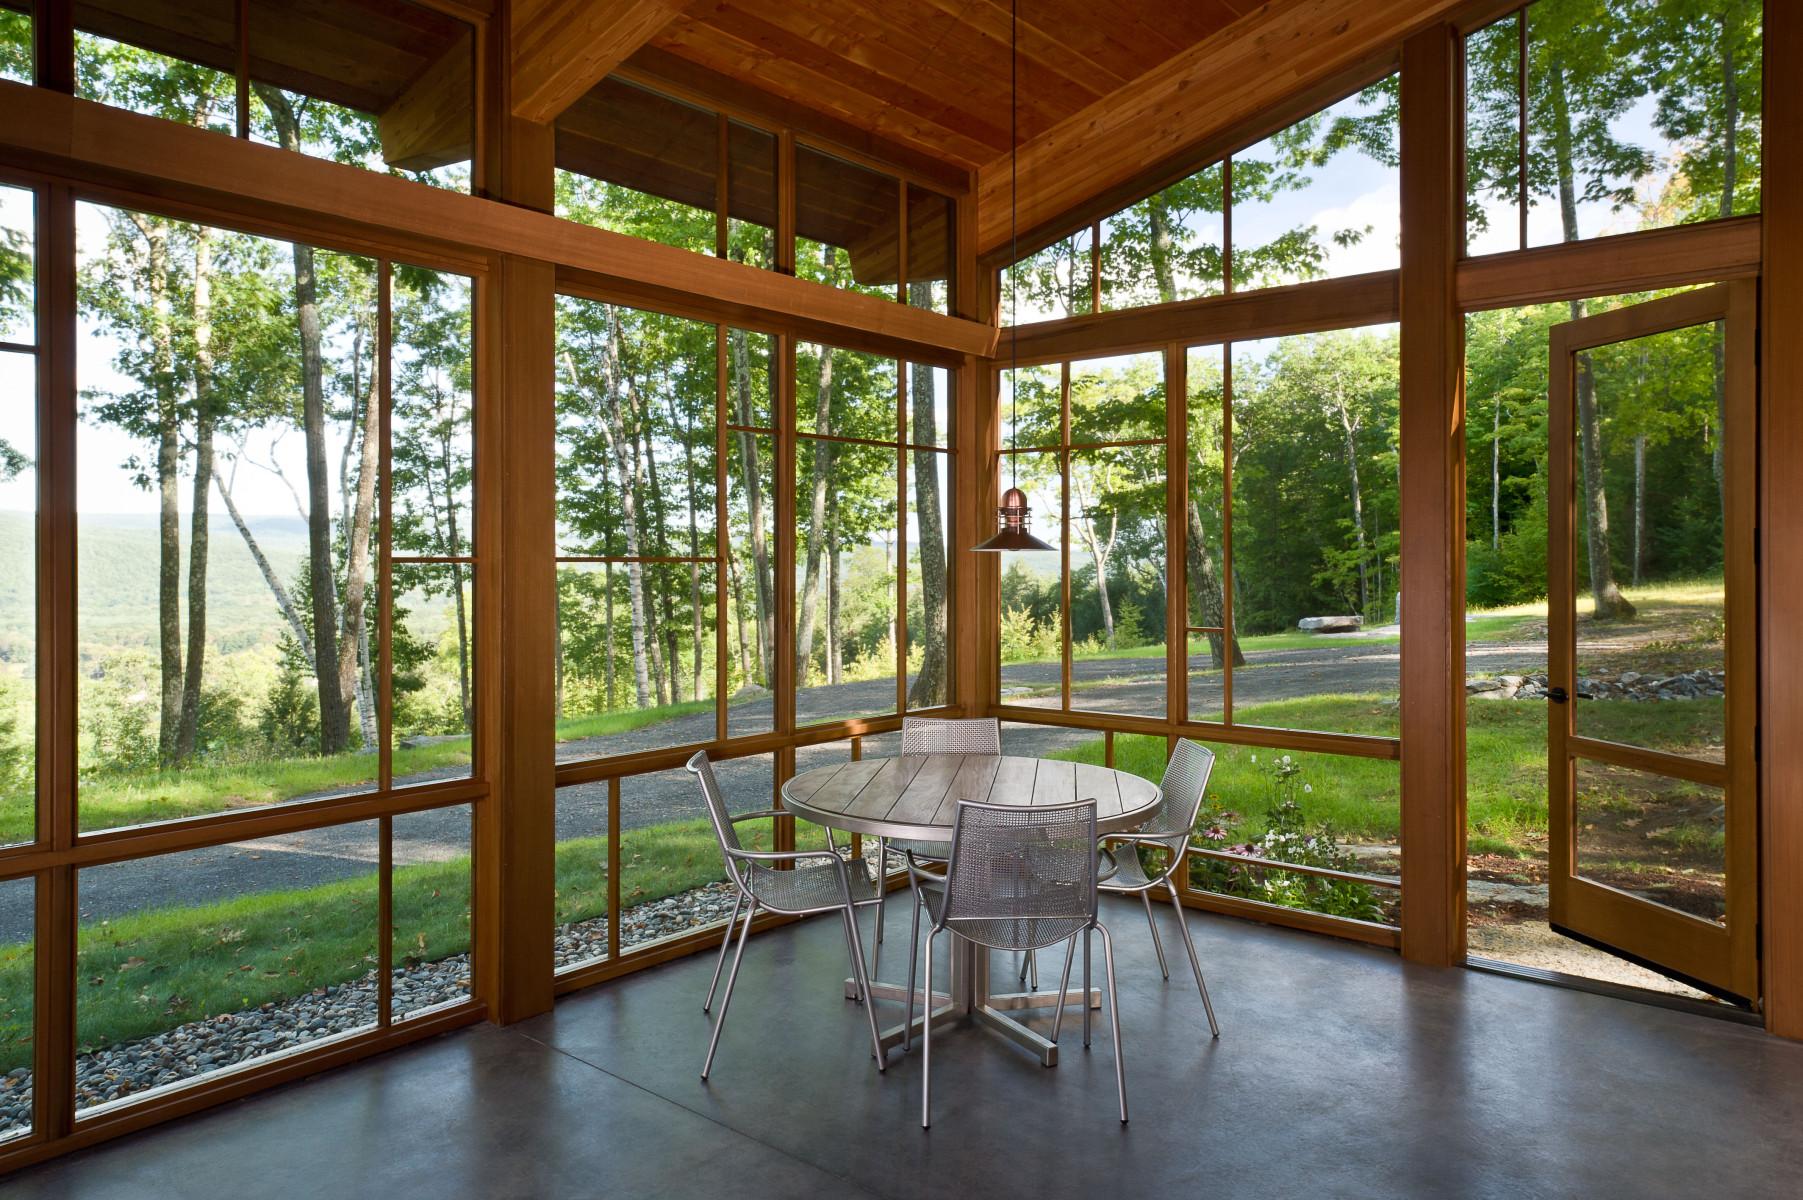 GB-modern-Cabin-SE-screen-porch